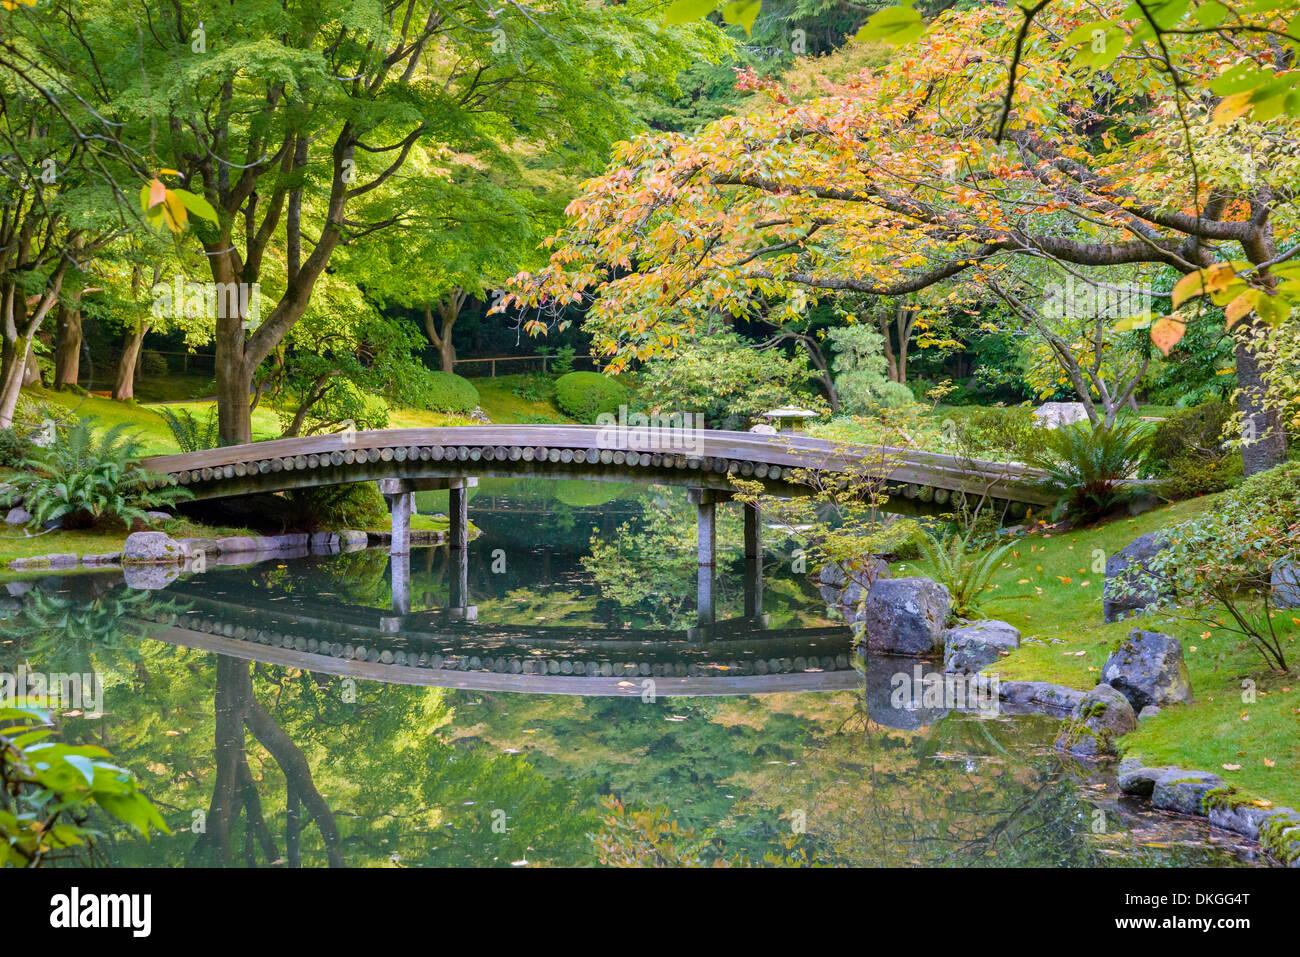 Bridge over pond, Nitobe Memorial Garden, a traditional Japanese garden UBC, Vancouver, British Columbia, Canada